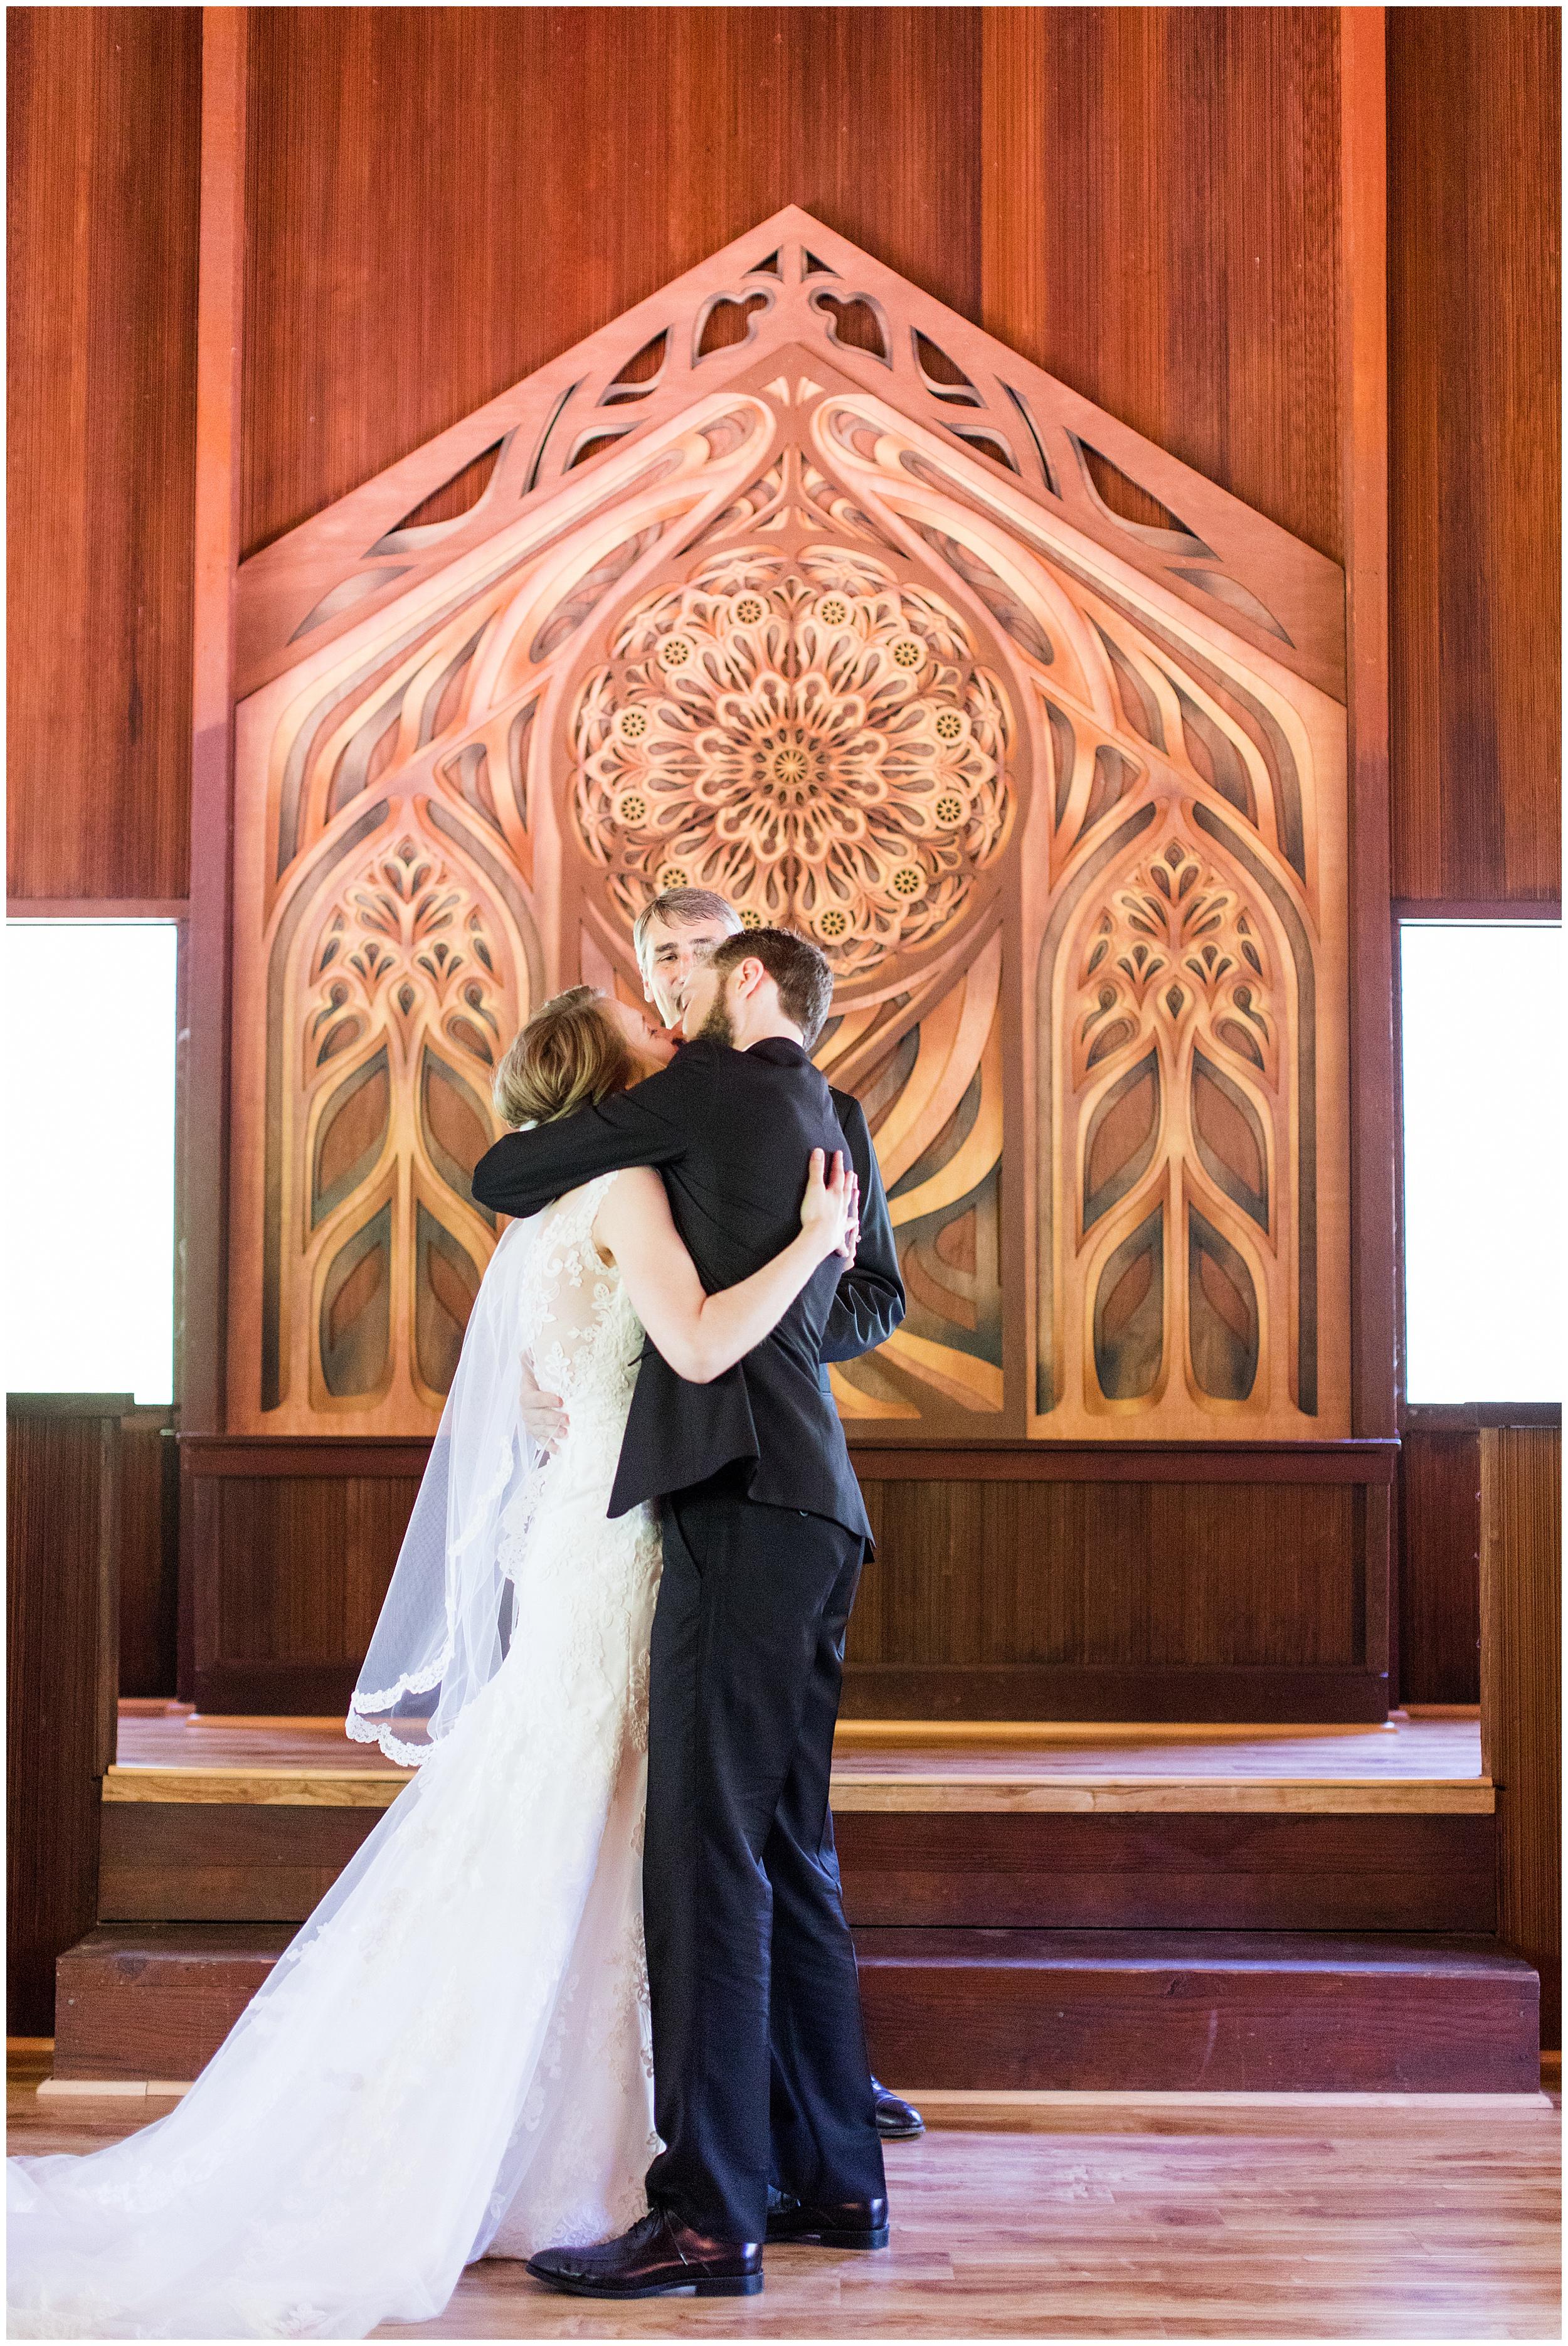 2019 chapel on the hill los gatos san jose bay area wedding photographer angela sue photography_0039.jpg